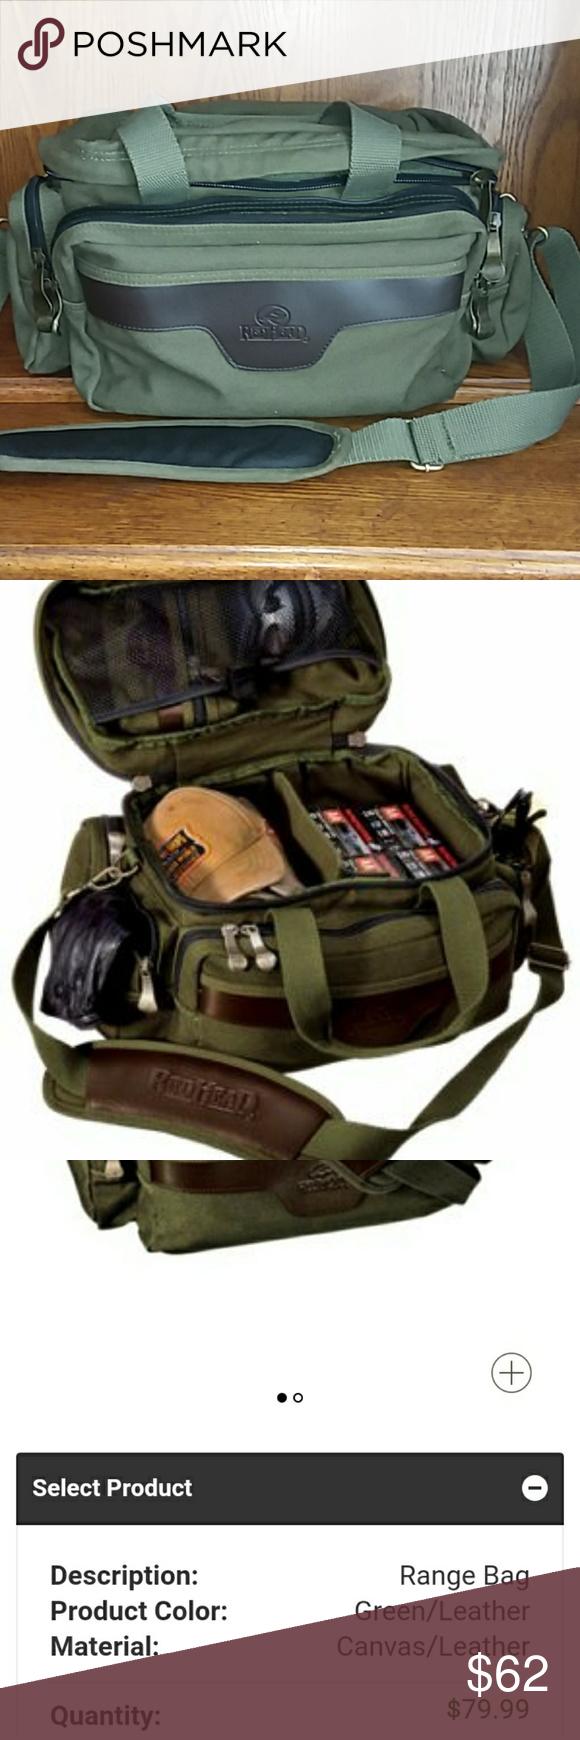 f302a93fec5e6 Sportsmans Warehouse Hunting Packs | Building Materials Bargain Center